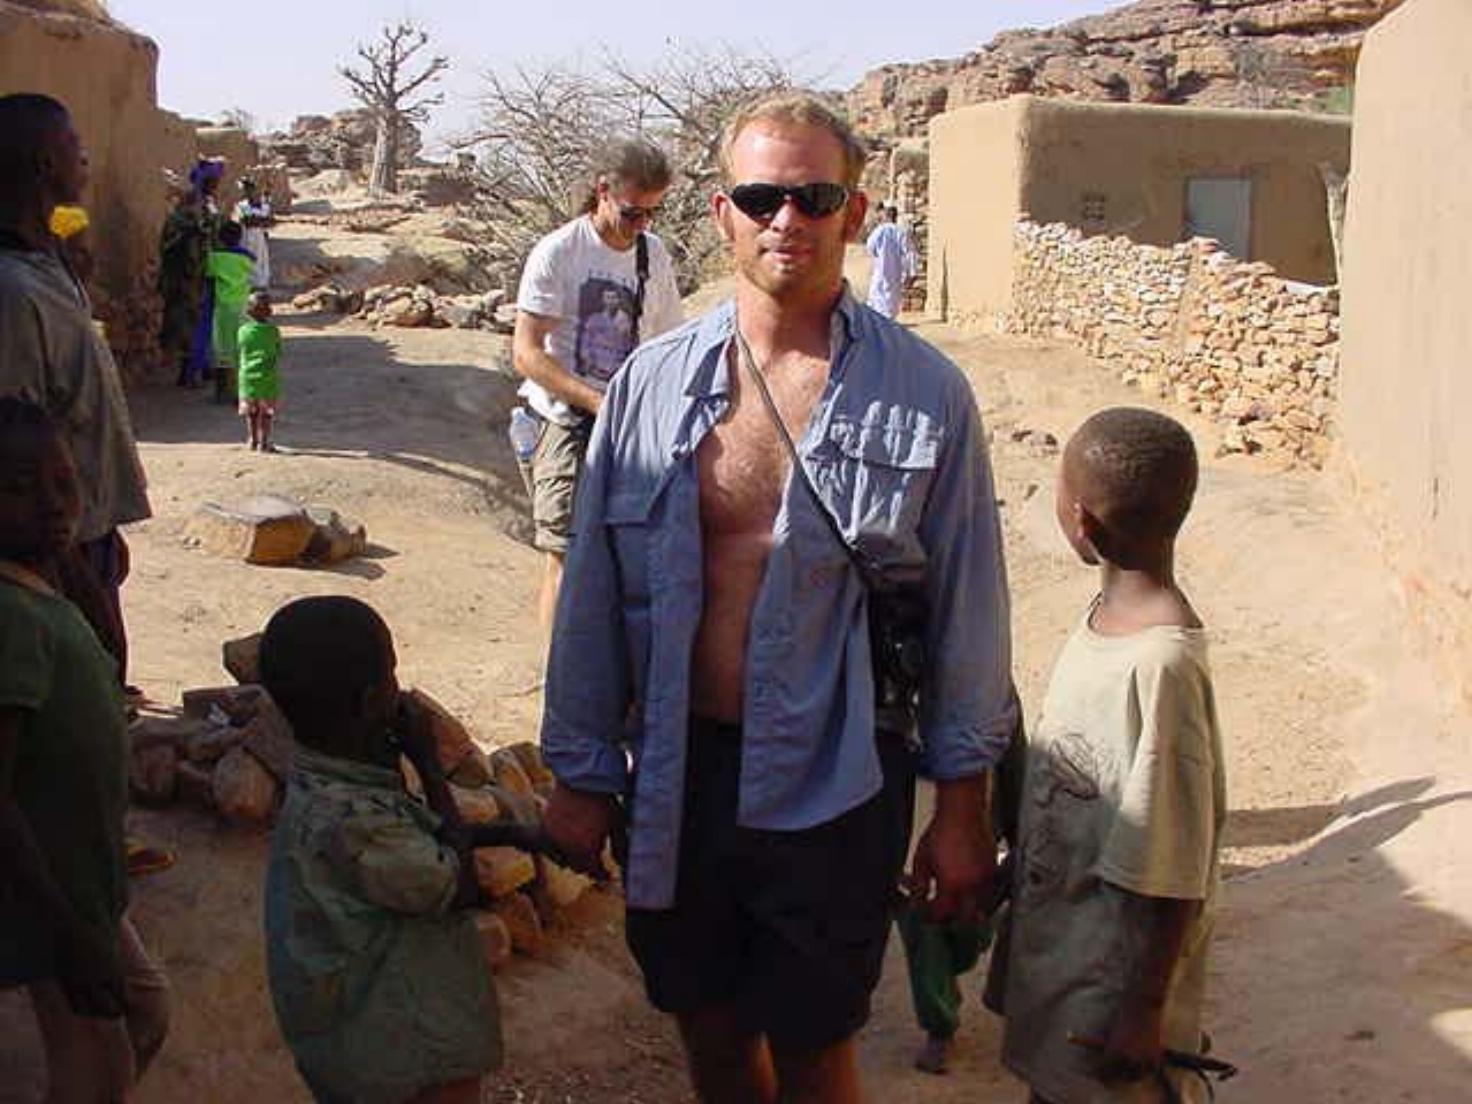 Shane Ballensky & local village childrenn